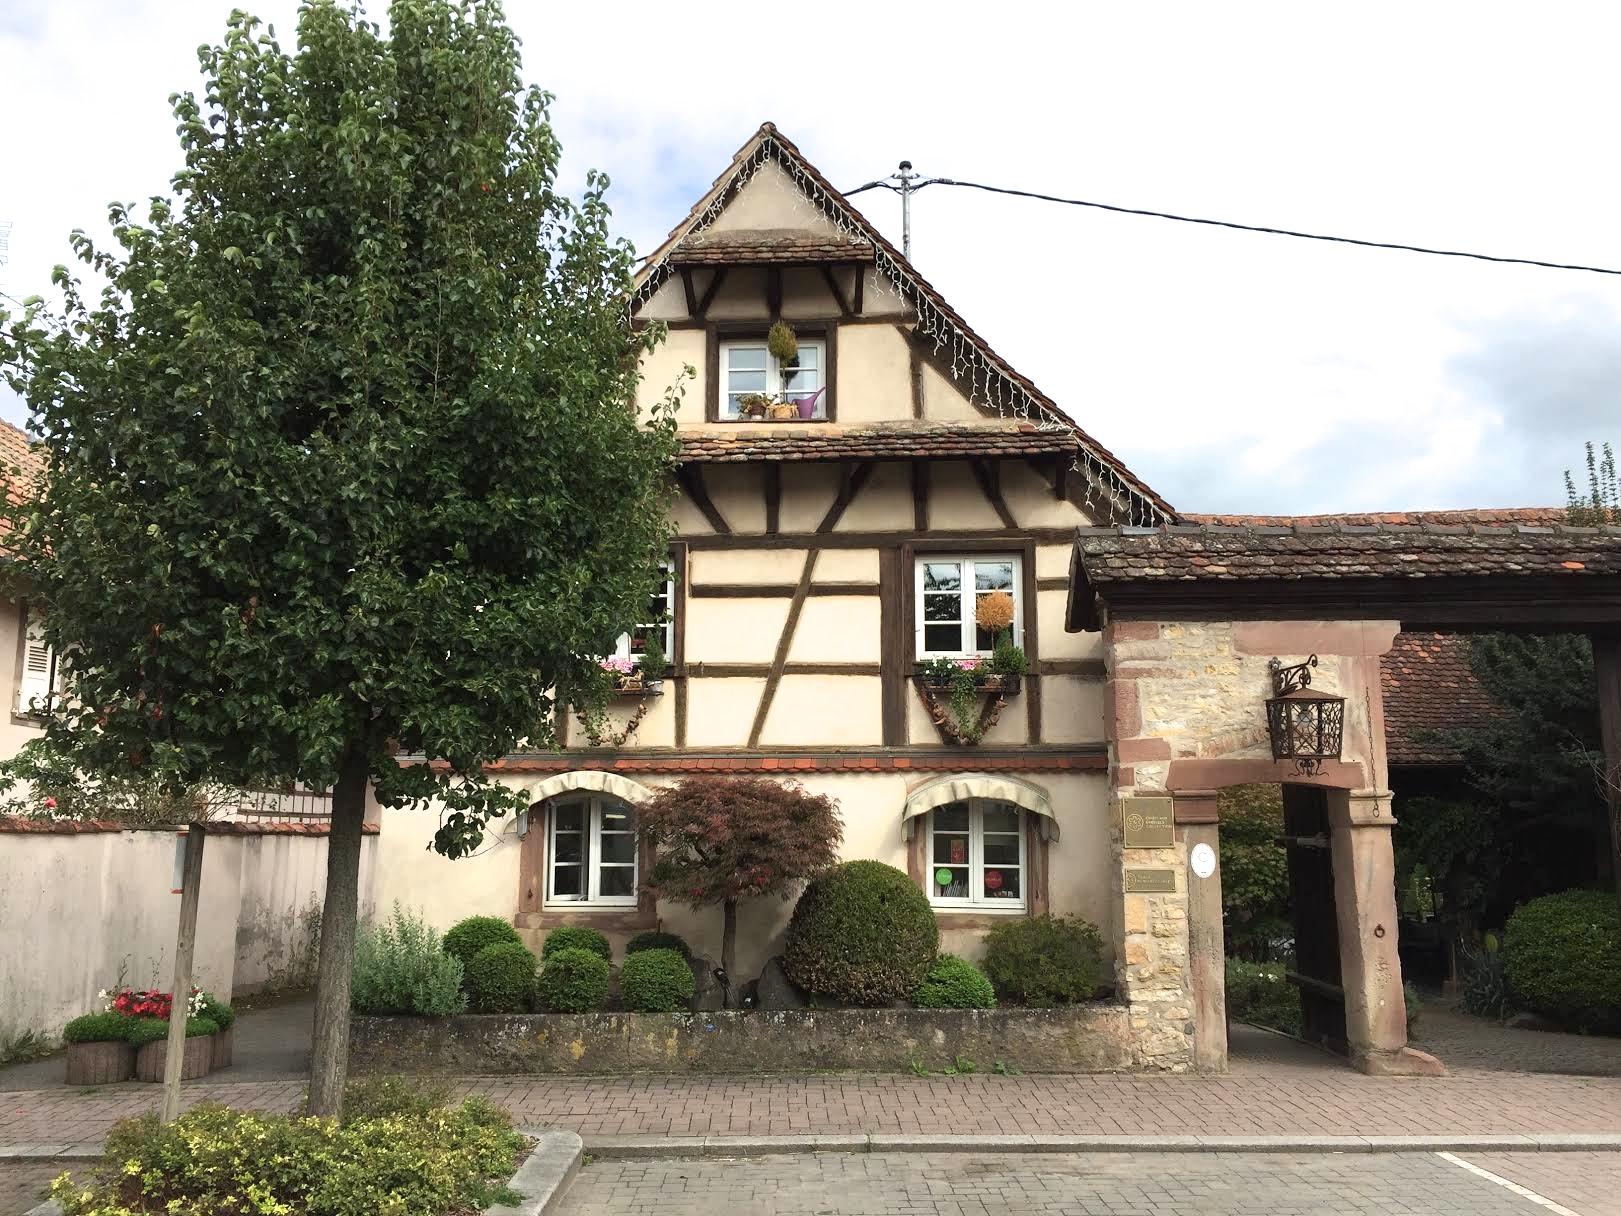 blog-mode-lifestyle-deco-beaute-voyage-strasbourg